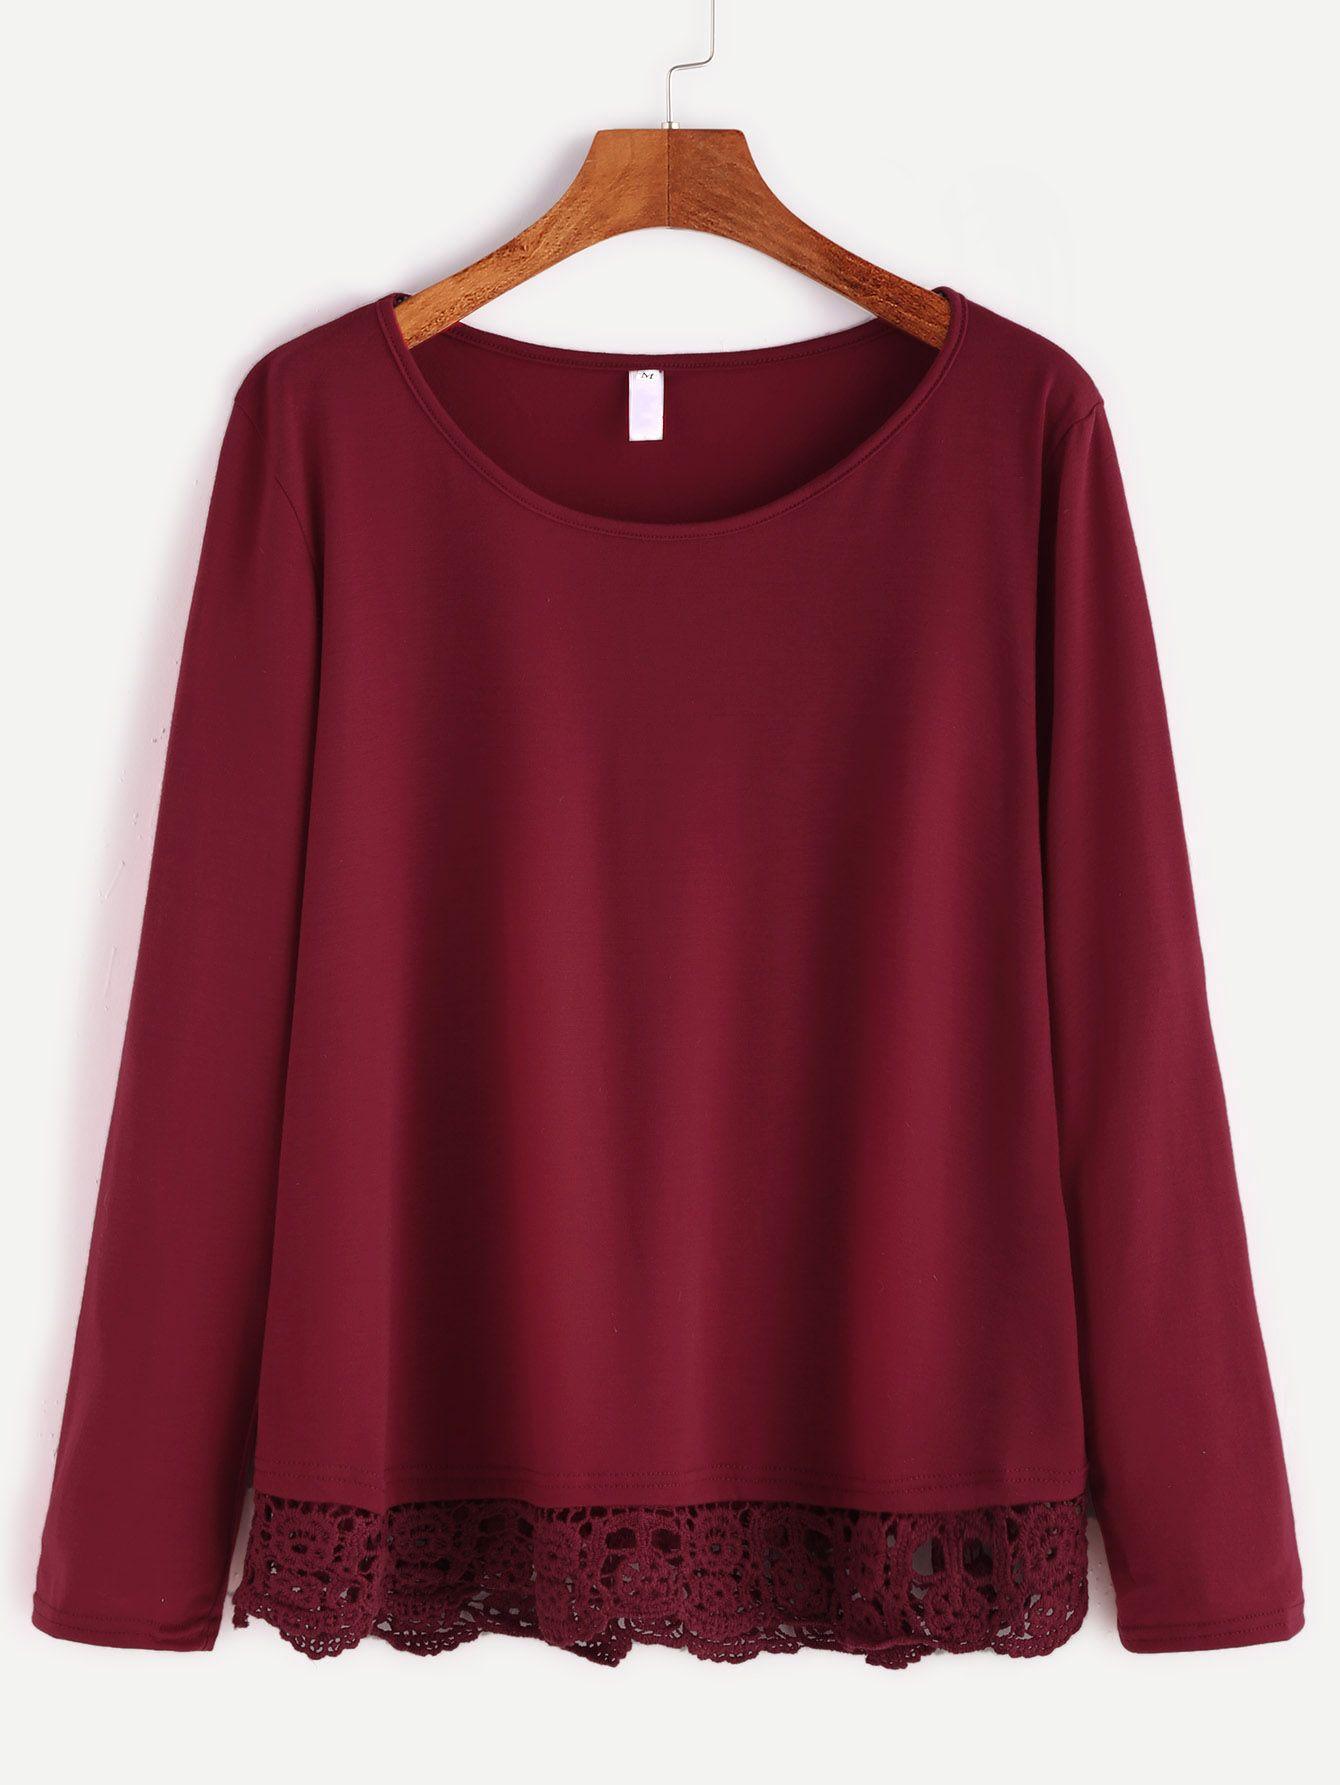 cd1dc1bd370 Shop Burgundy Contrast Crochet Hem T-shirt online. SheIn offers Burgundy  Contrast Crochet Hem T-shirt   more to fit your fashionable needs.